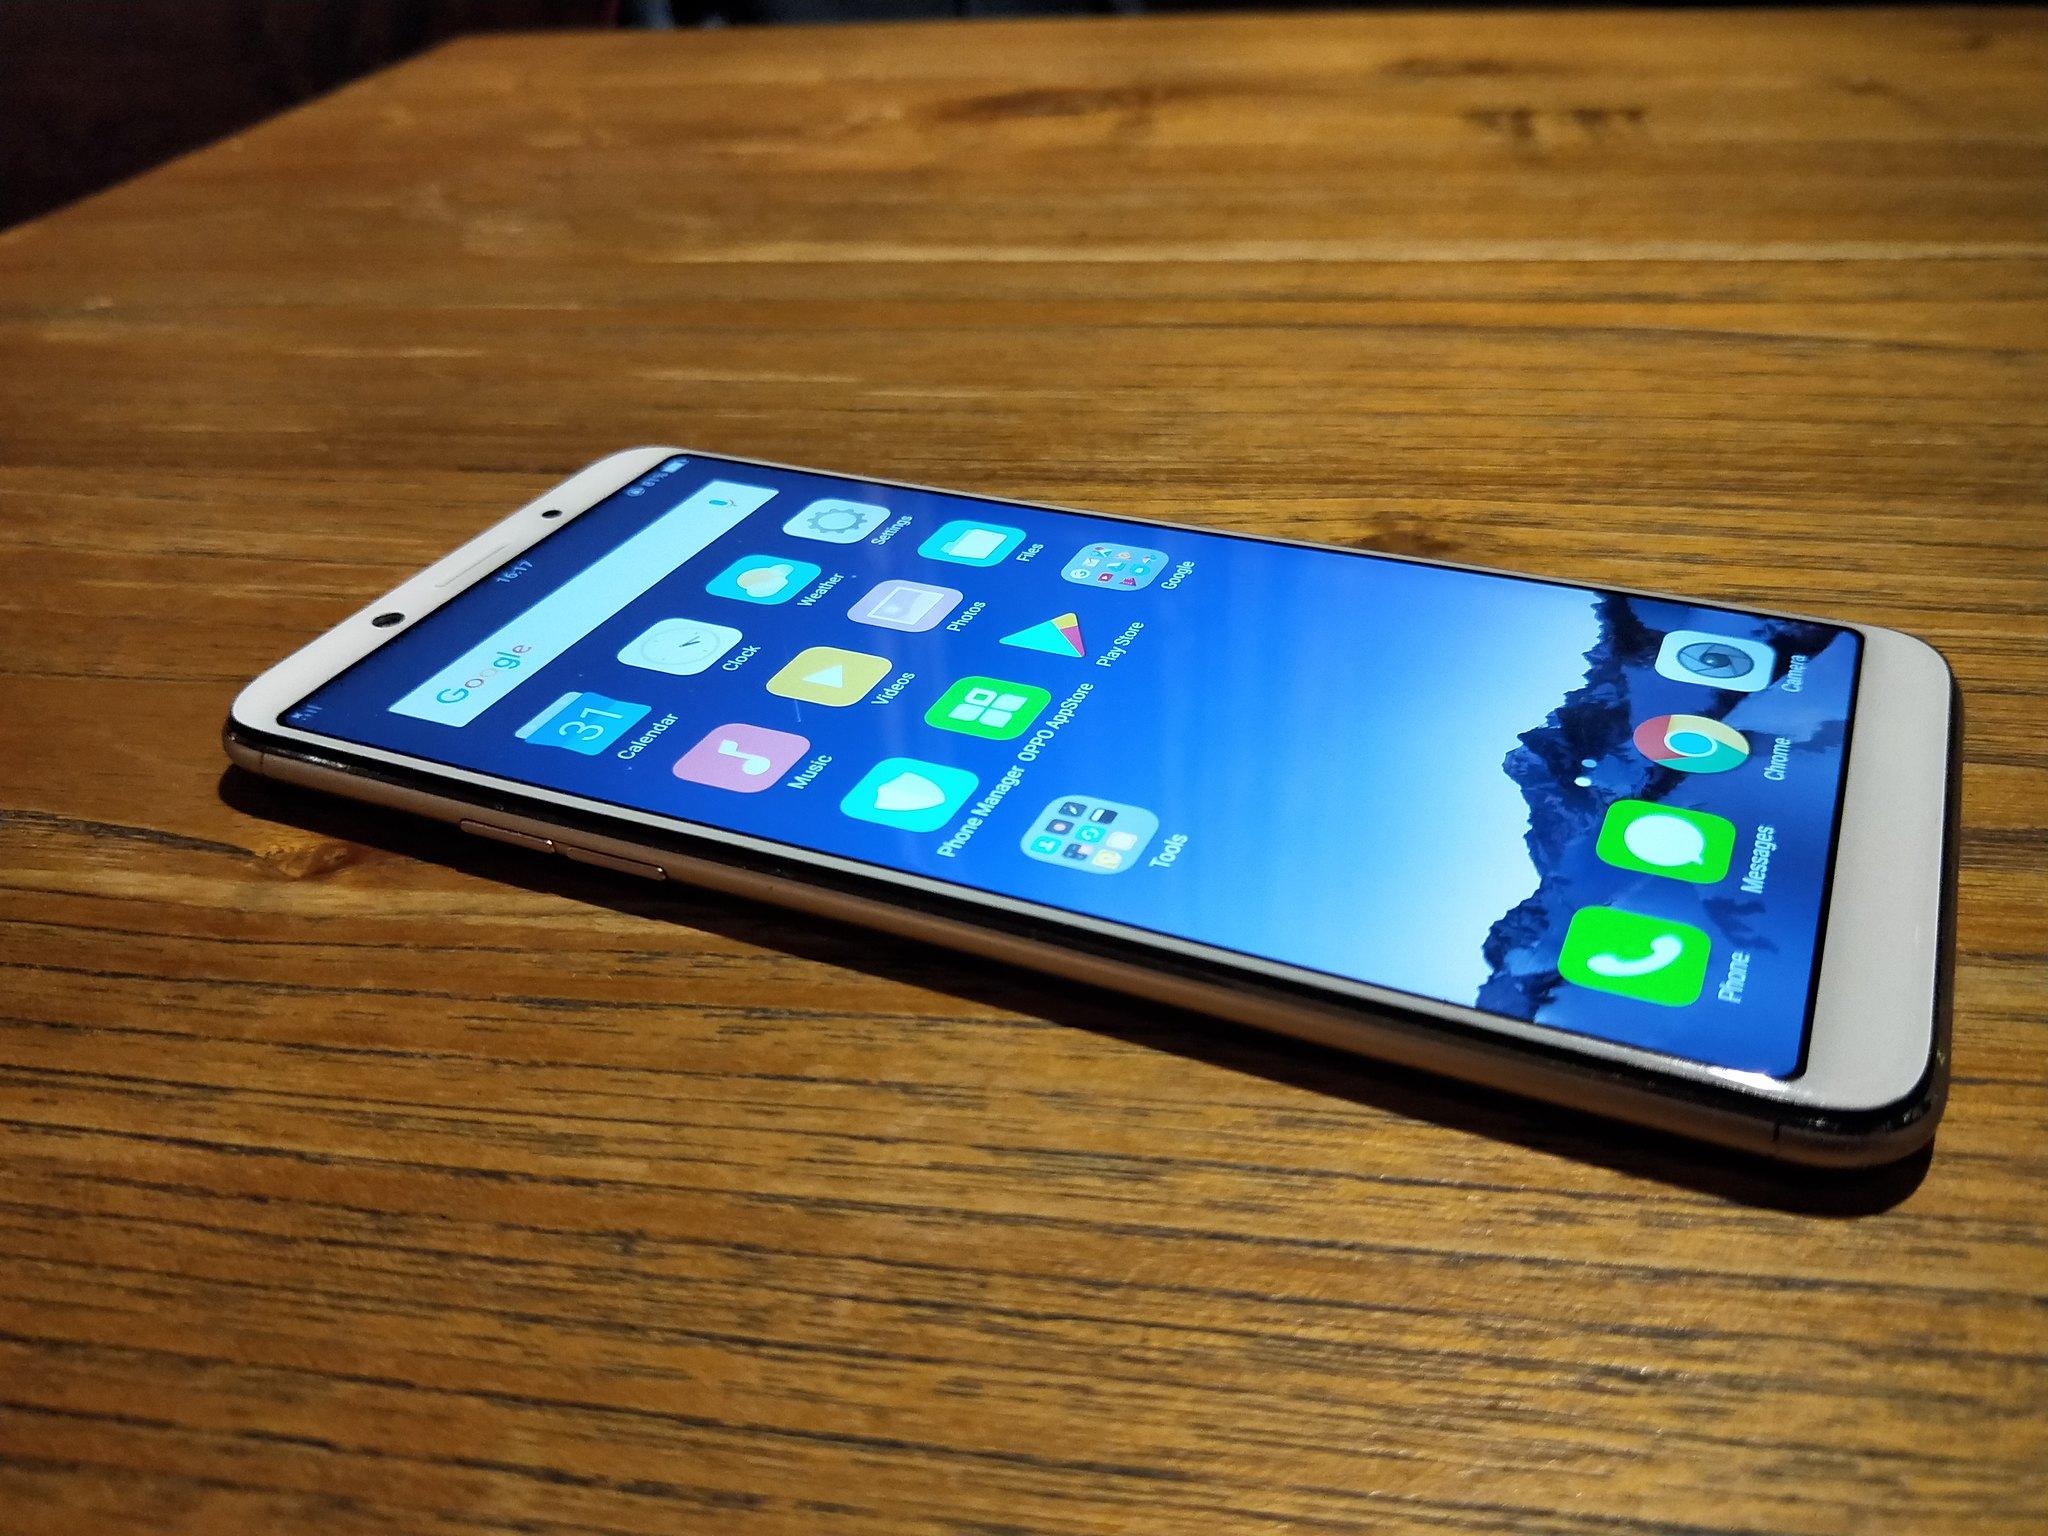 Sisi kiri bodi Oppo F5. Liputan6.com/Iskandar